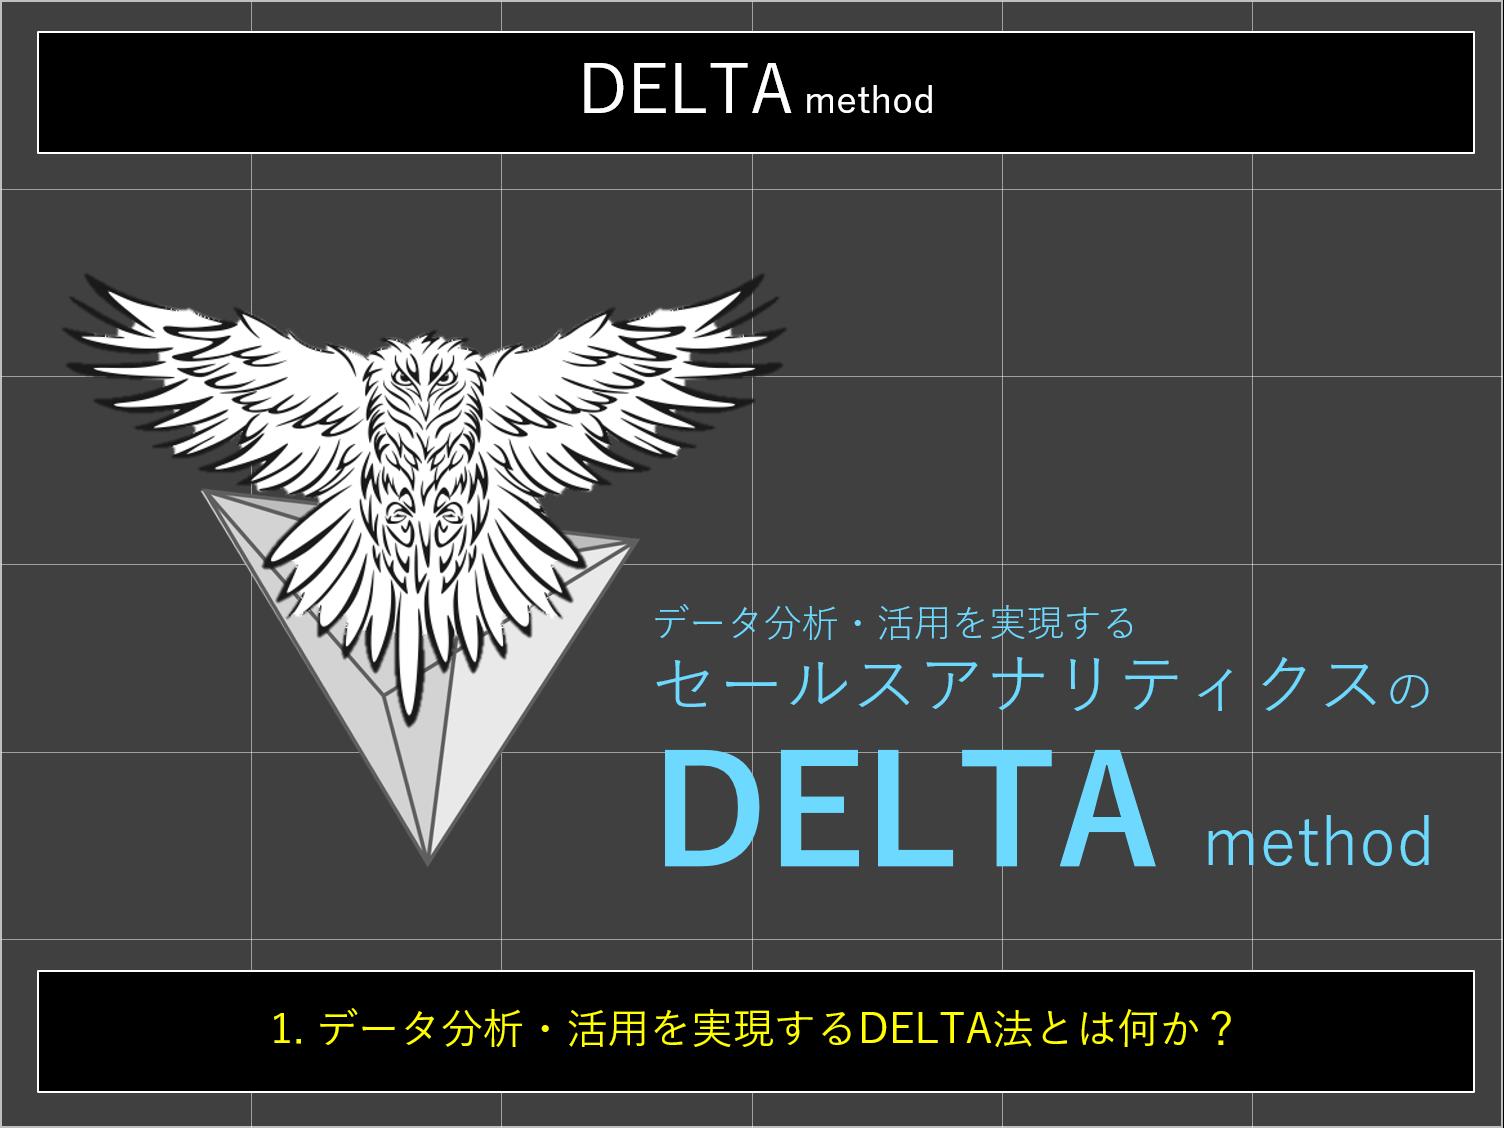 DELTA法001|データ分析・活用を実現するDELTA法とは何か?